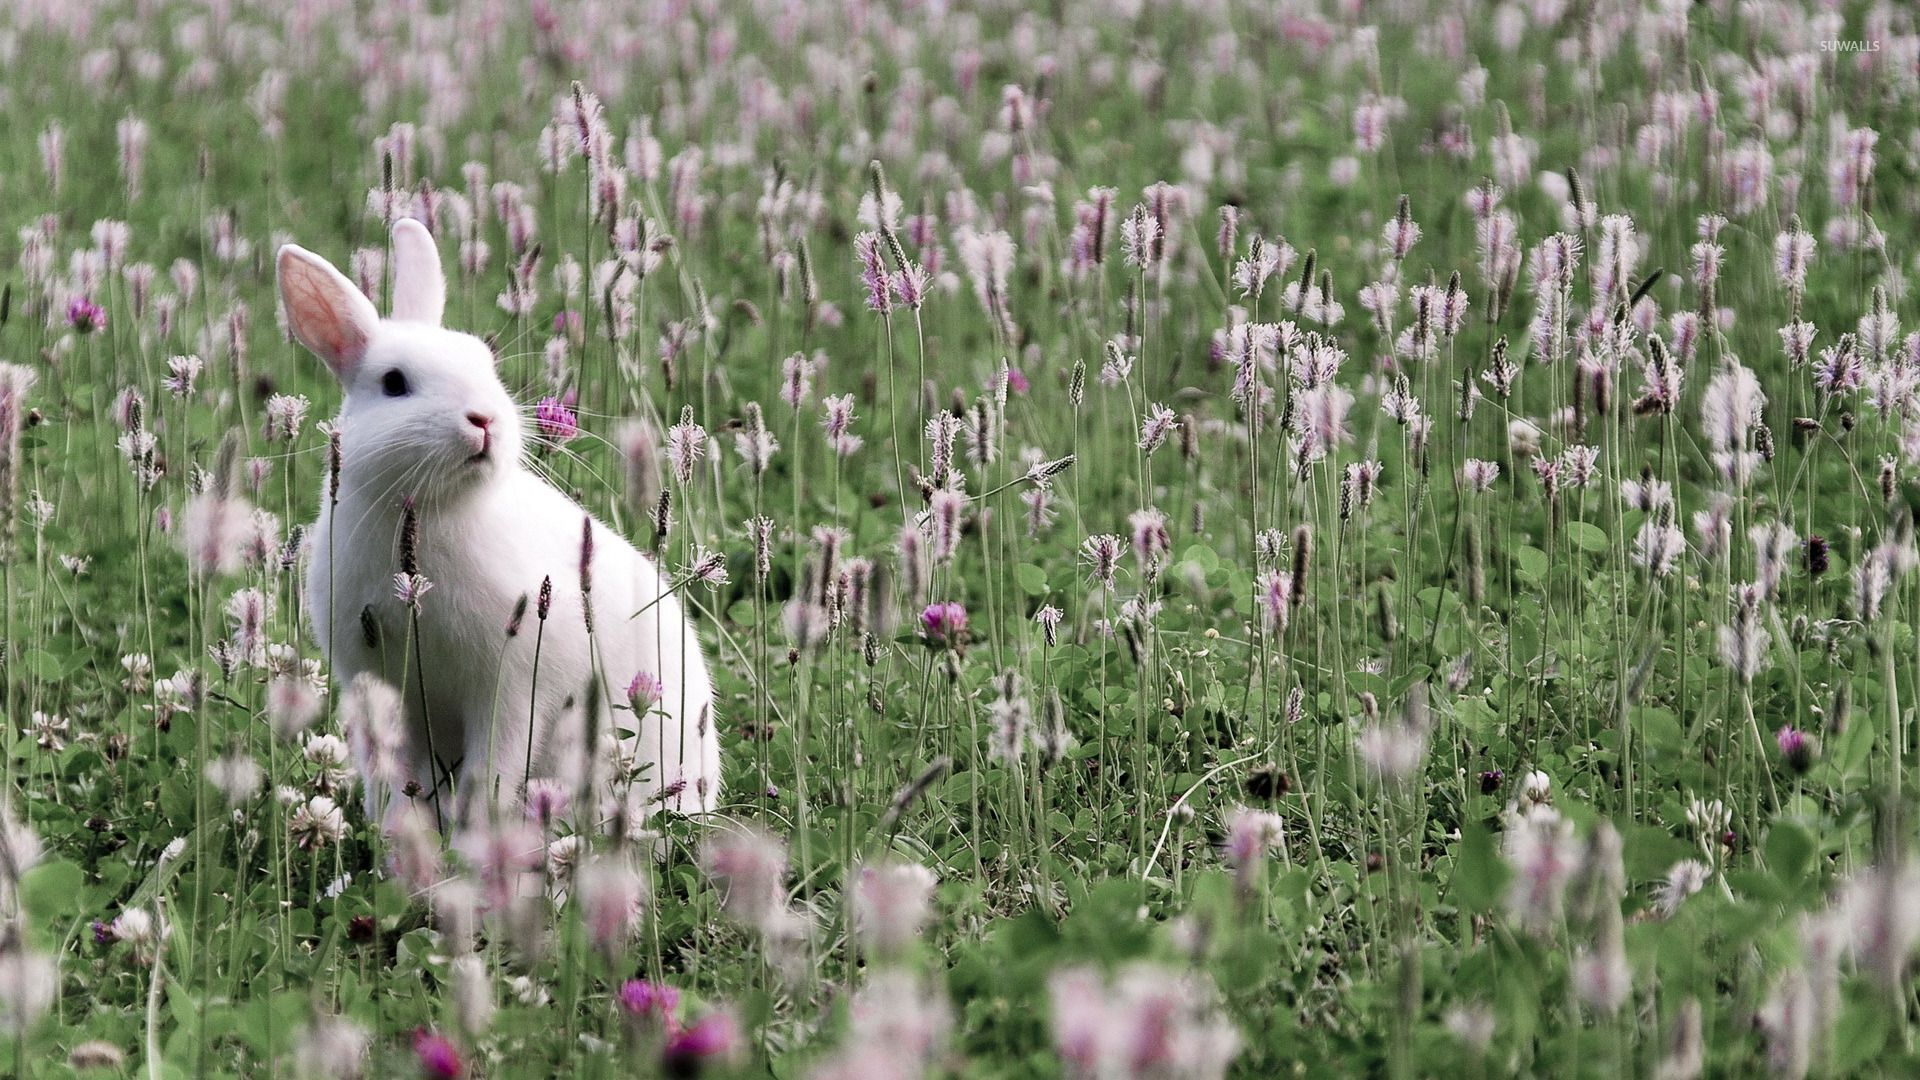 Pink rabbit tornado wallpaper Digital Art wallpapers